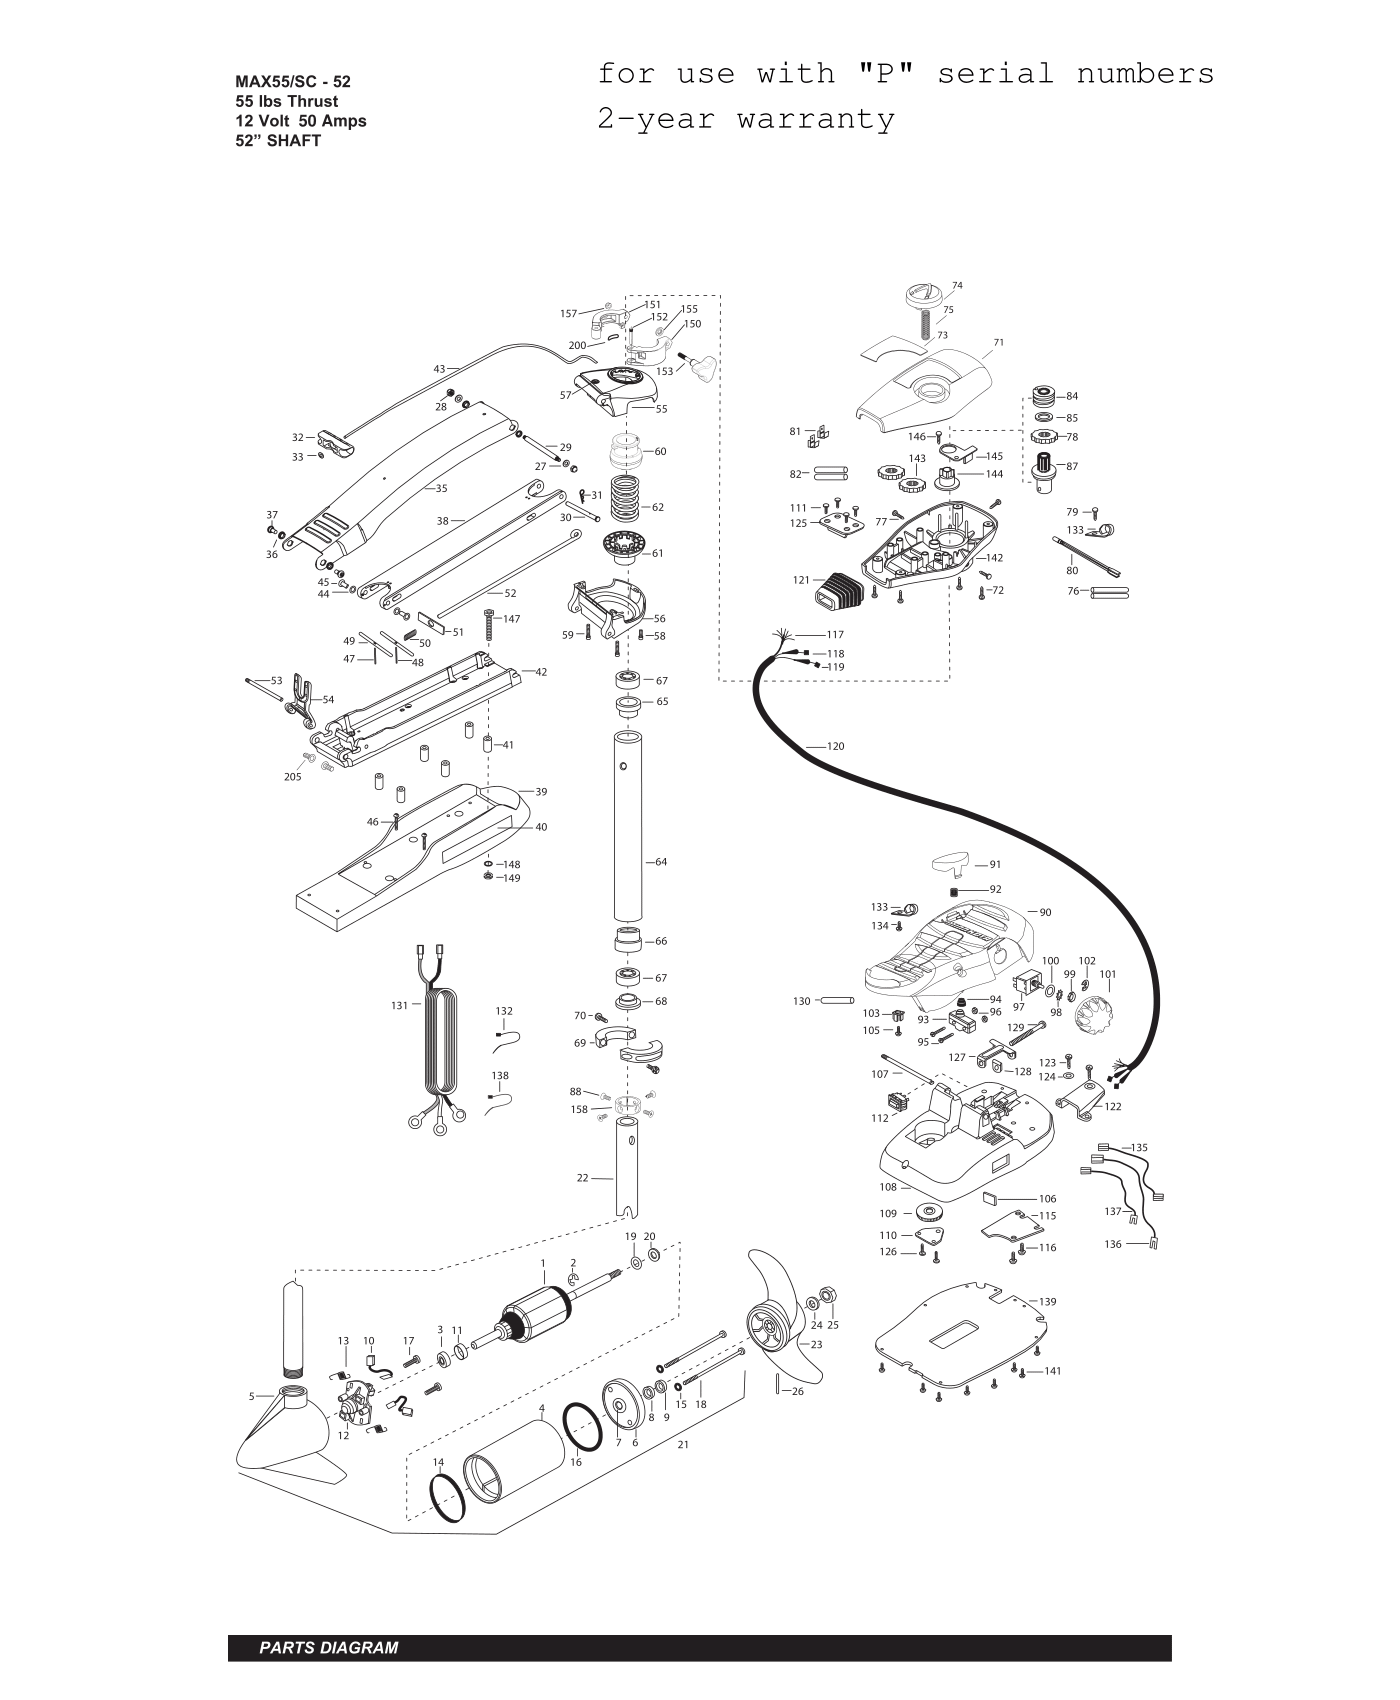 minn kota riptide 55 wiring diagram autometer temperature gauge sc motor great installation of max 52 inch parts 2015 from fish307 com rh 24 volt controller